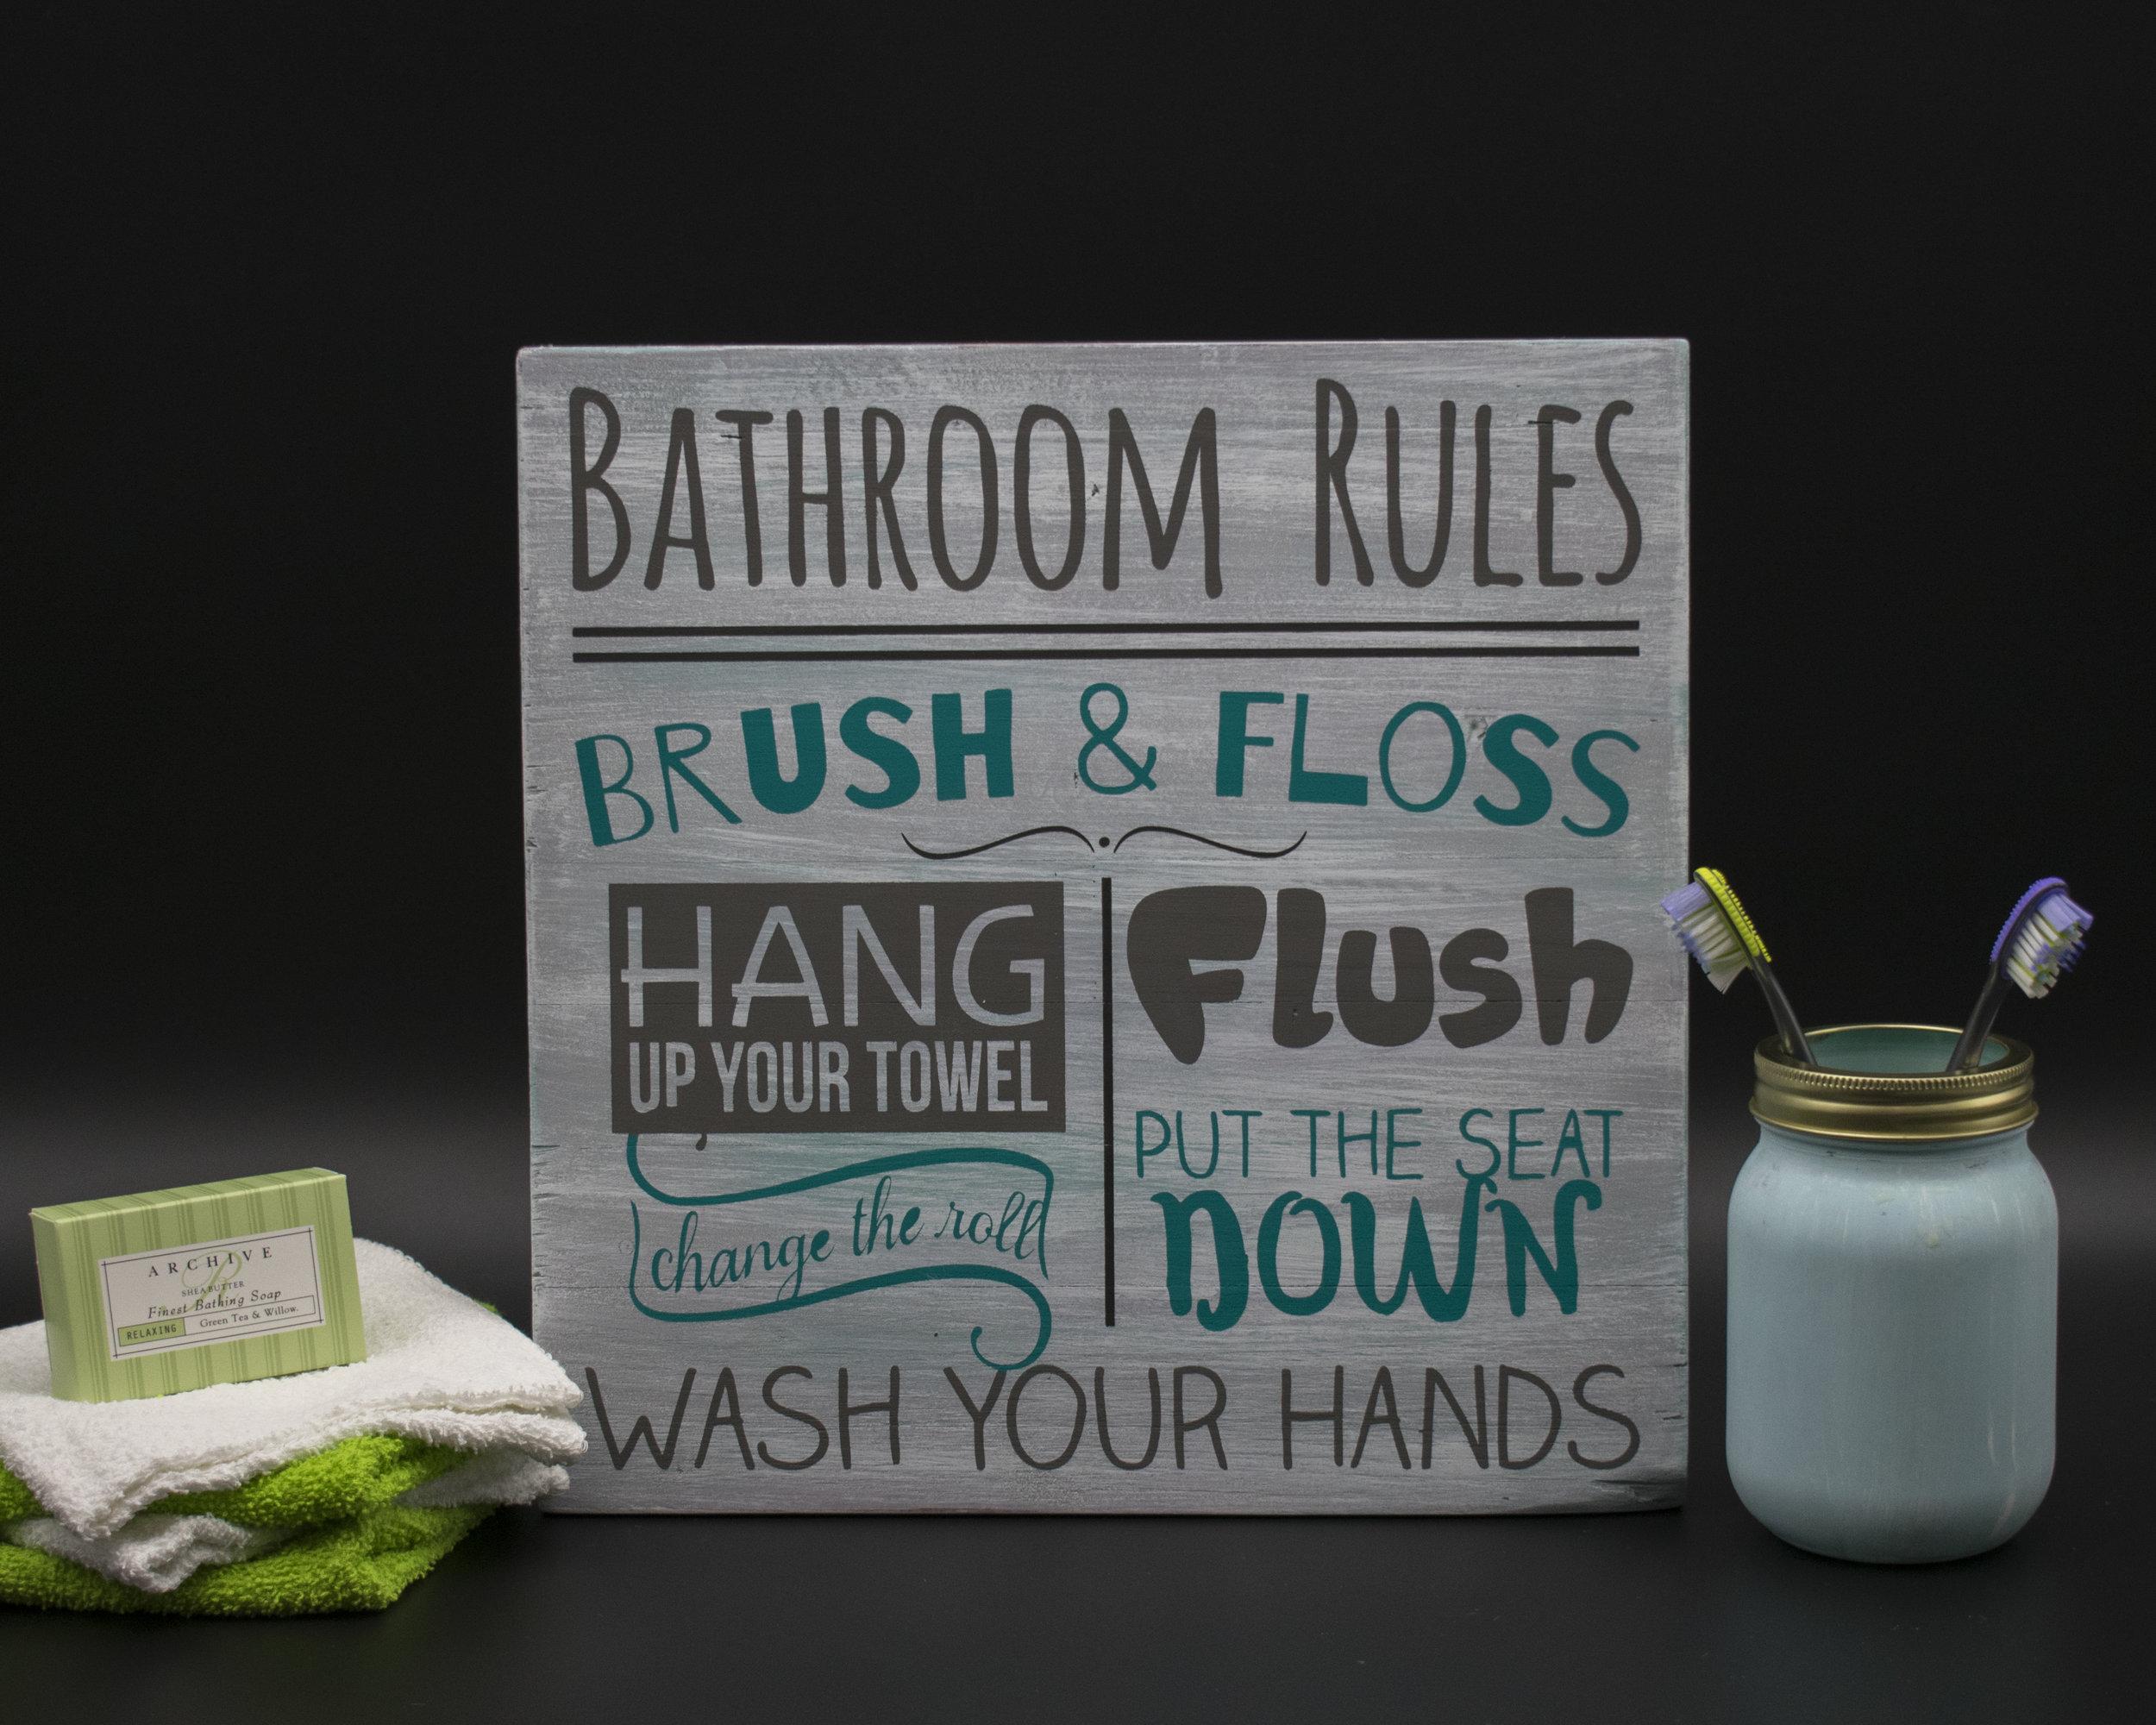 bathroomrules.jpg